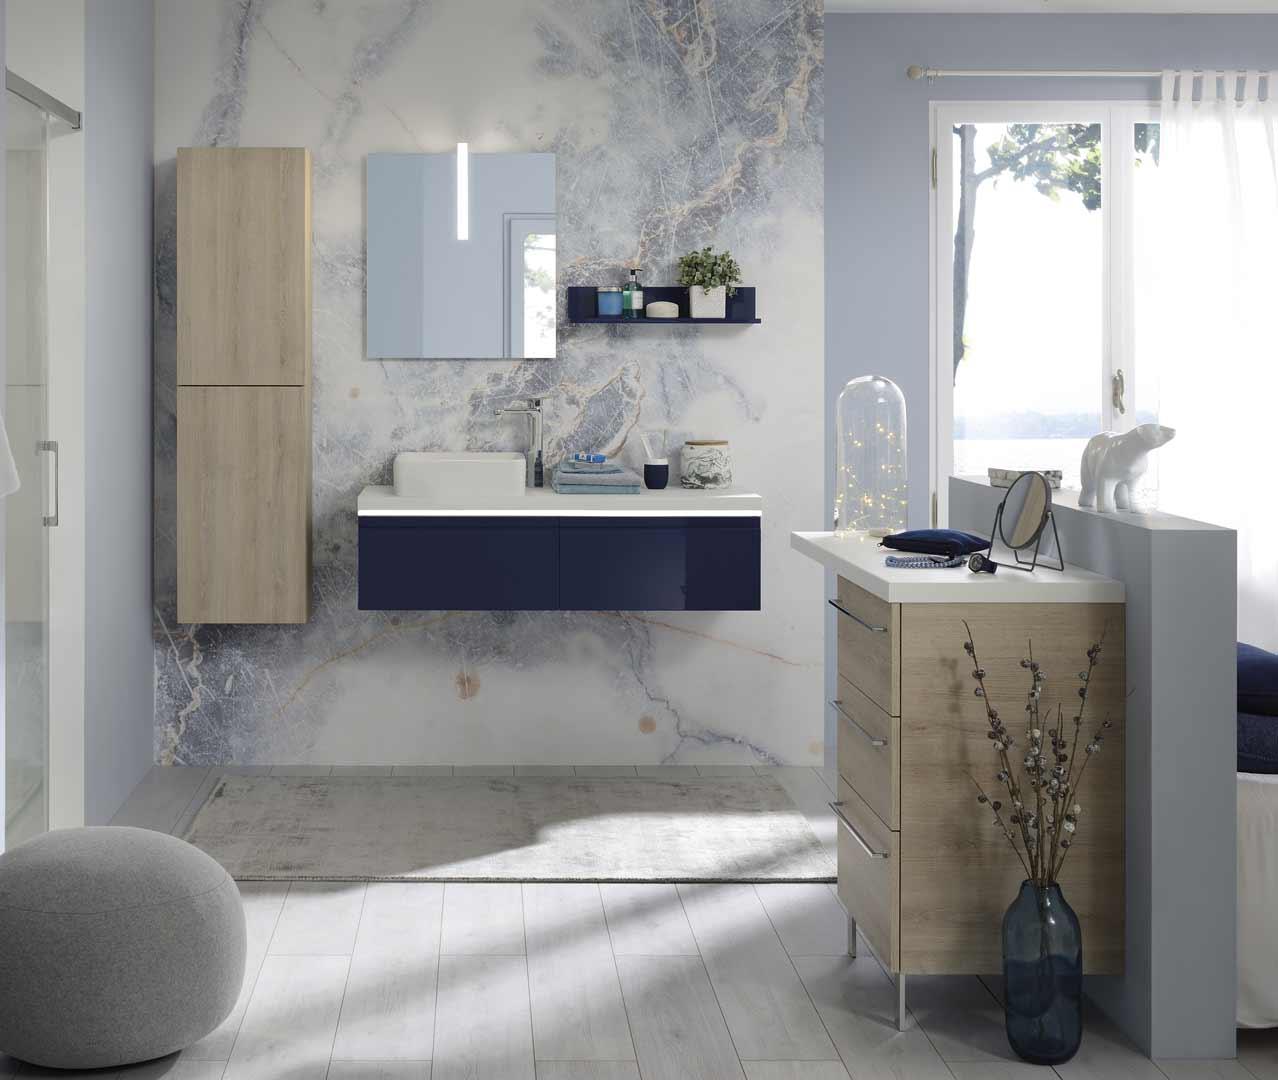 gamme halo meuble salle de bain design sanijura. Black Bedroom Furniture Sets. Home Design Ideas